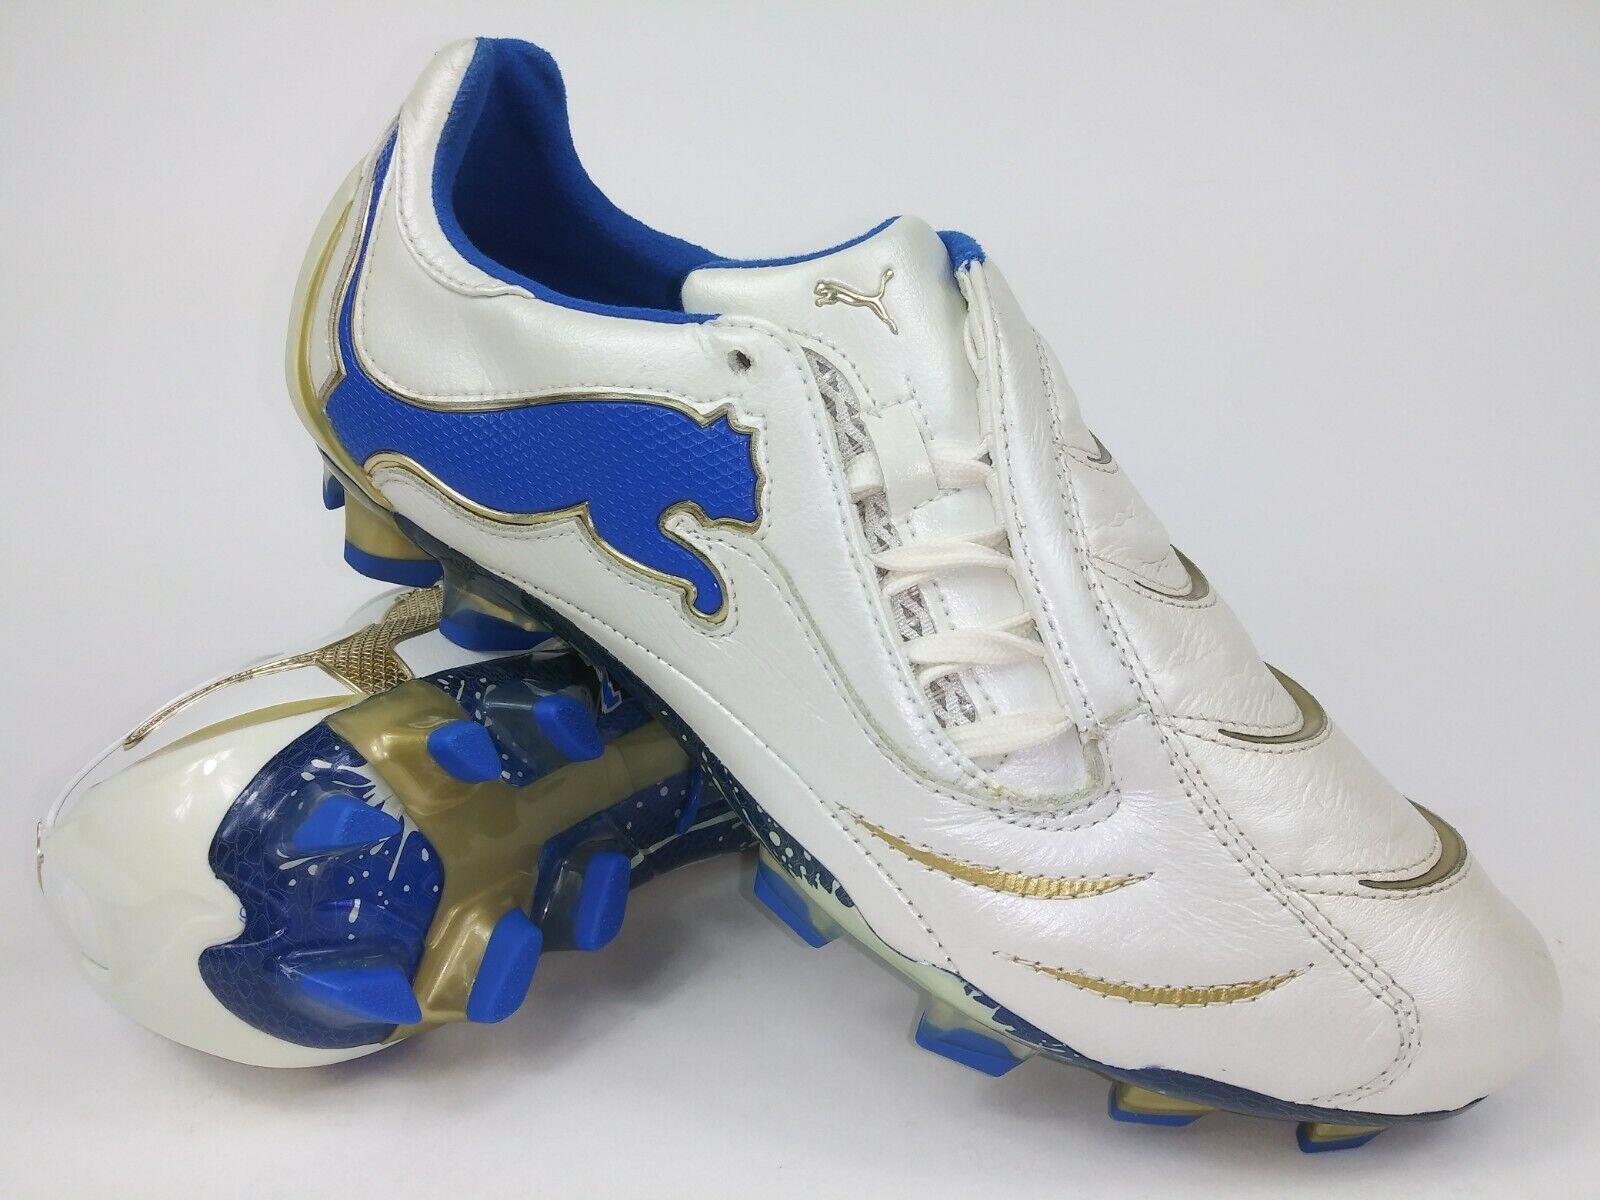 Zapatos Puma De Hombre Raro Powercat 1.10 FG 101898 02 Dorado blancoo Botines De Fútbol